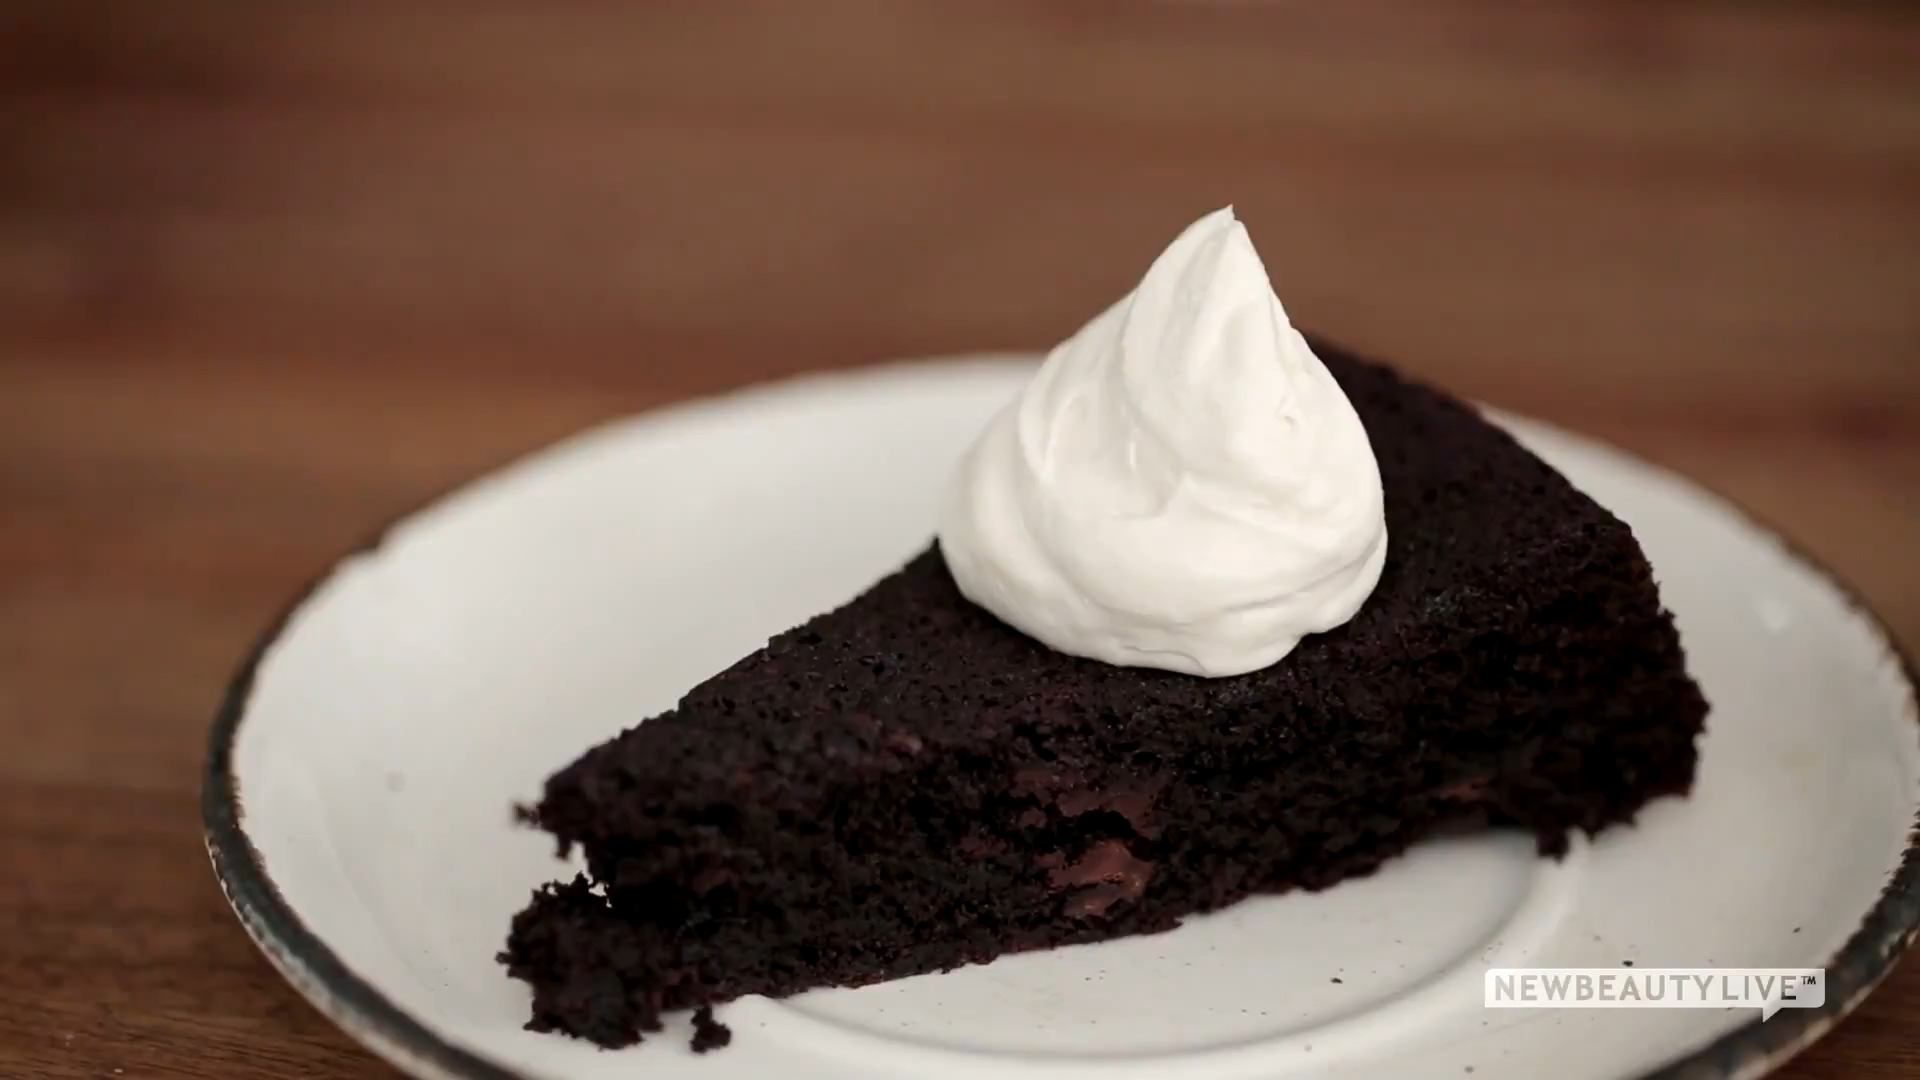 How to Make a Vegan, Gluten-Free Chocolate Cake